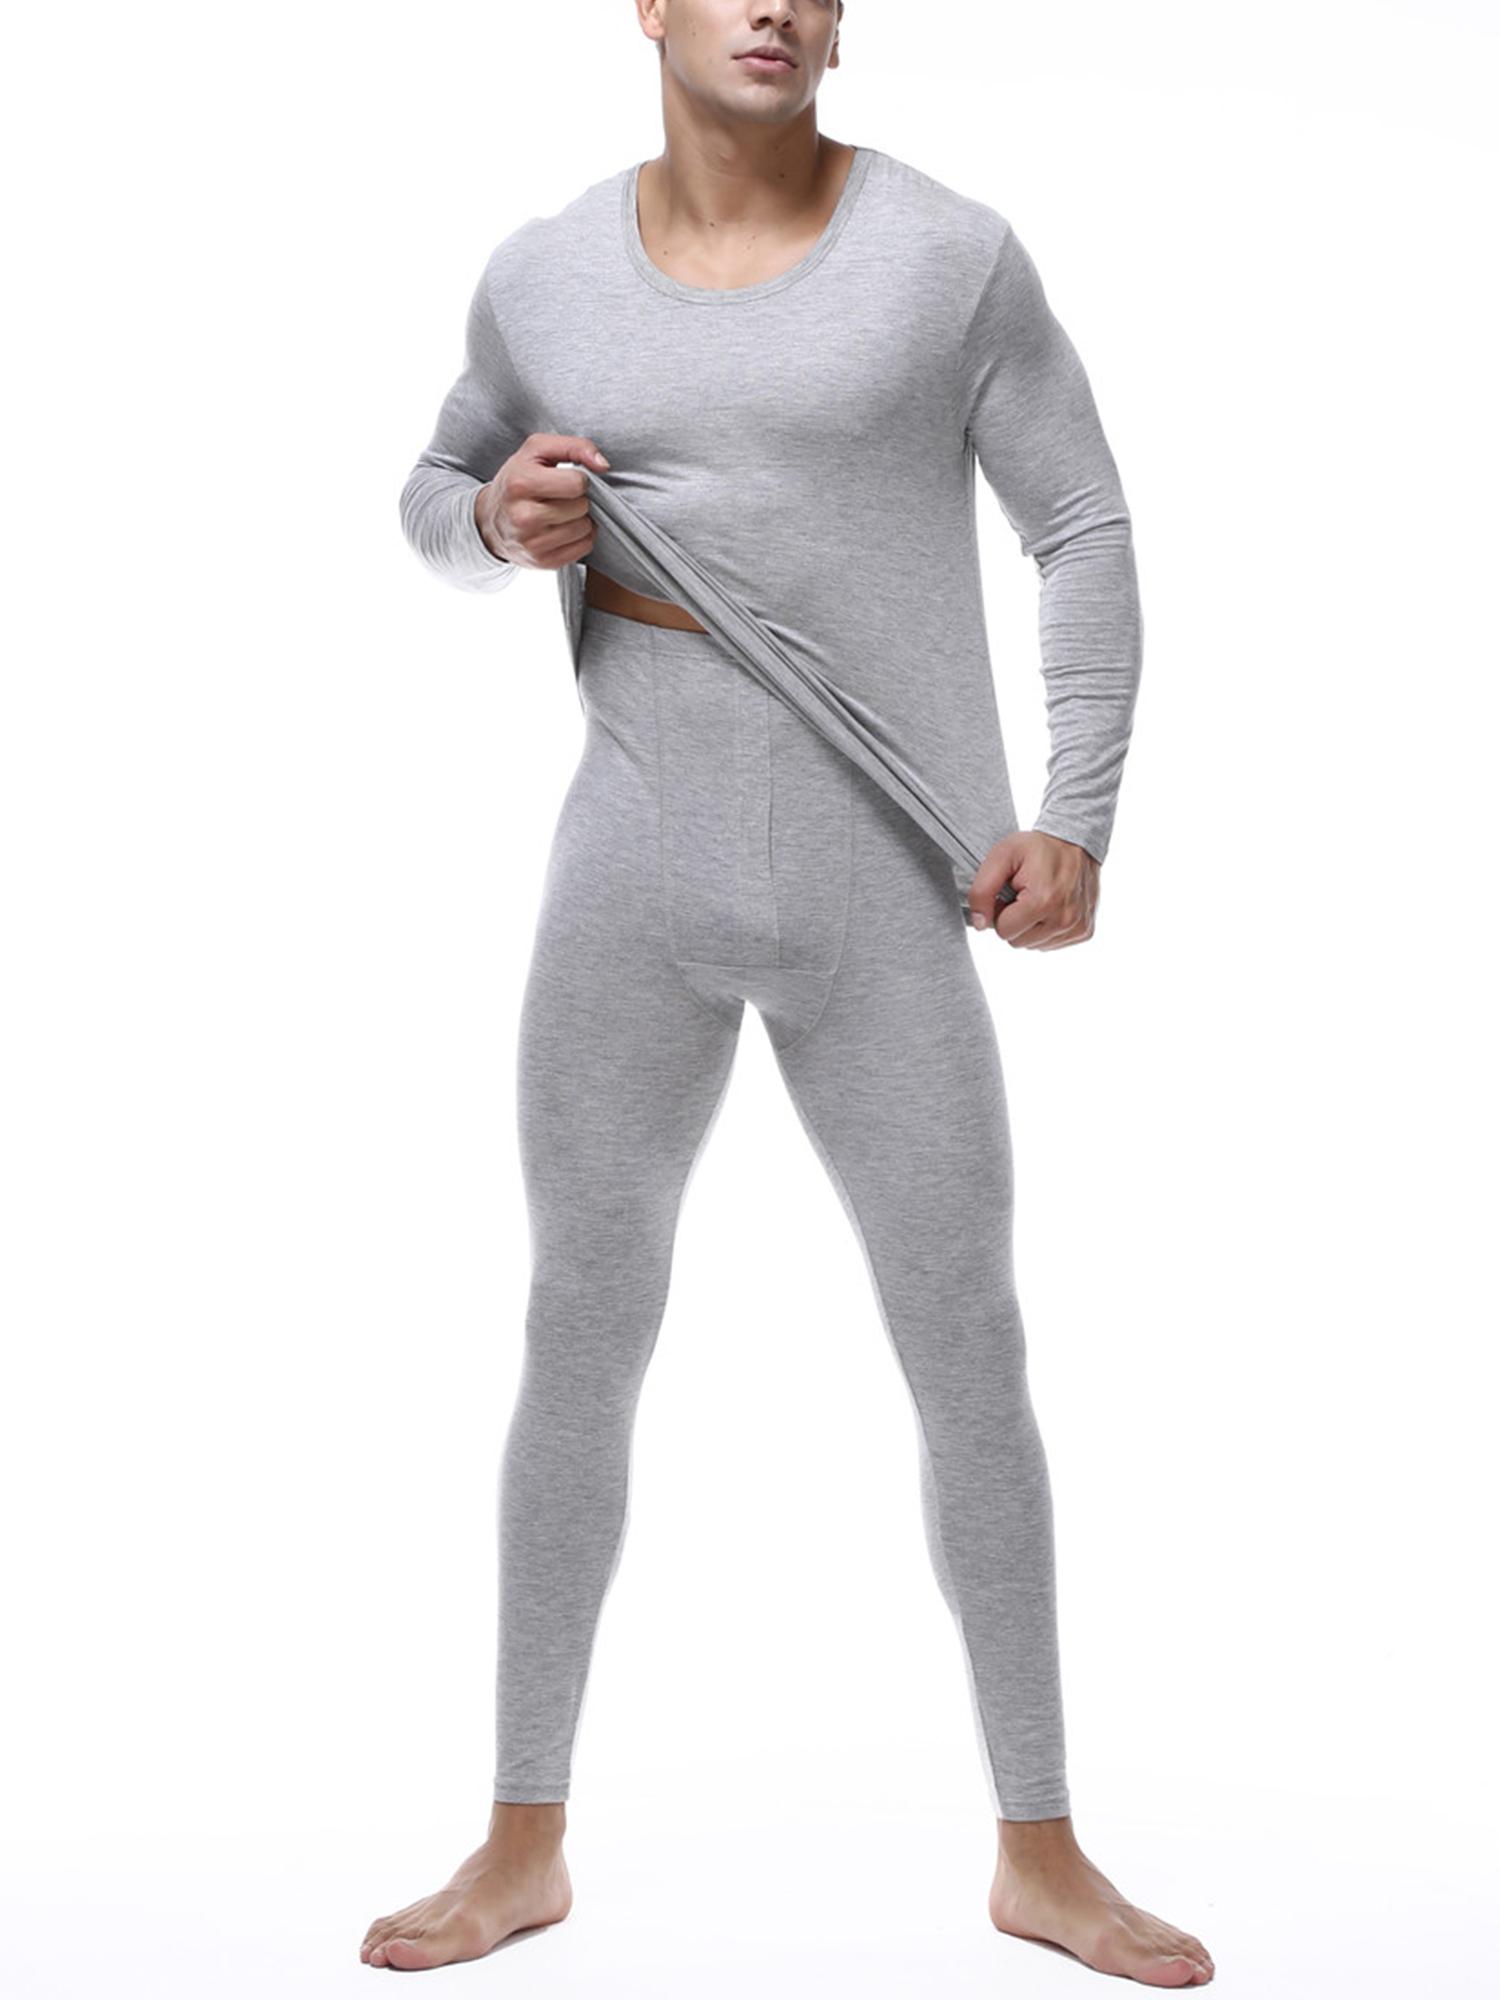 Men/'s Thermal Long Johns Trousers Warm Underwear White